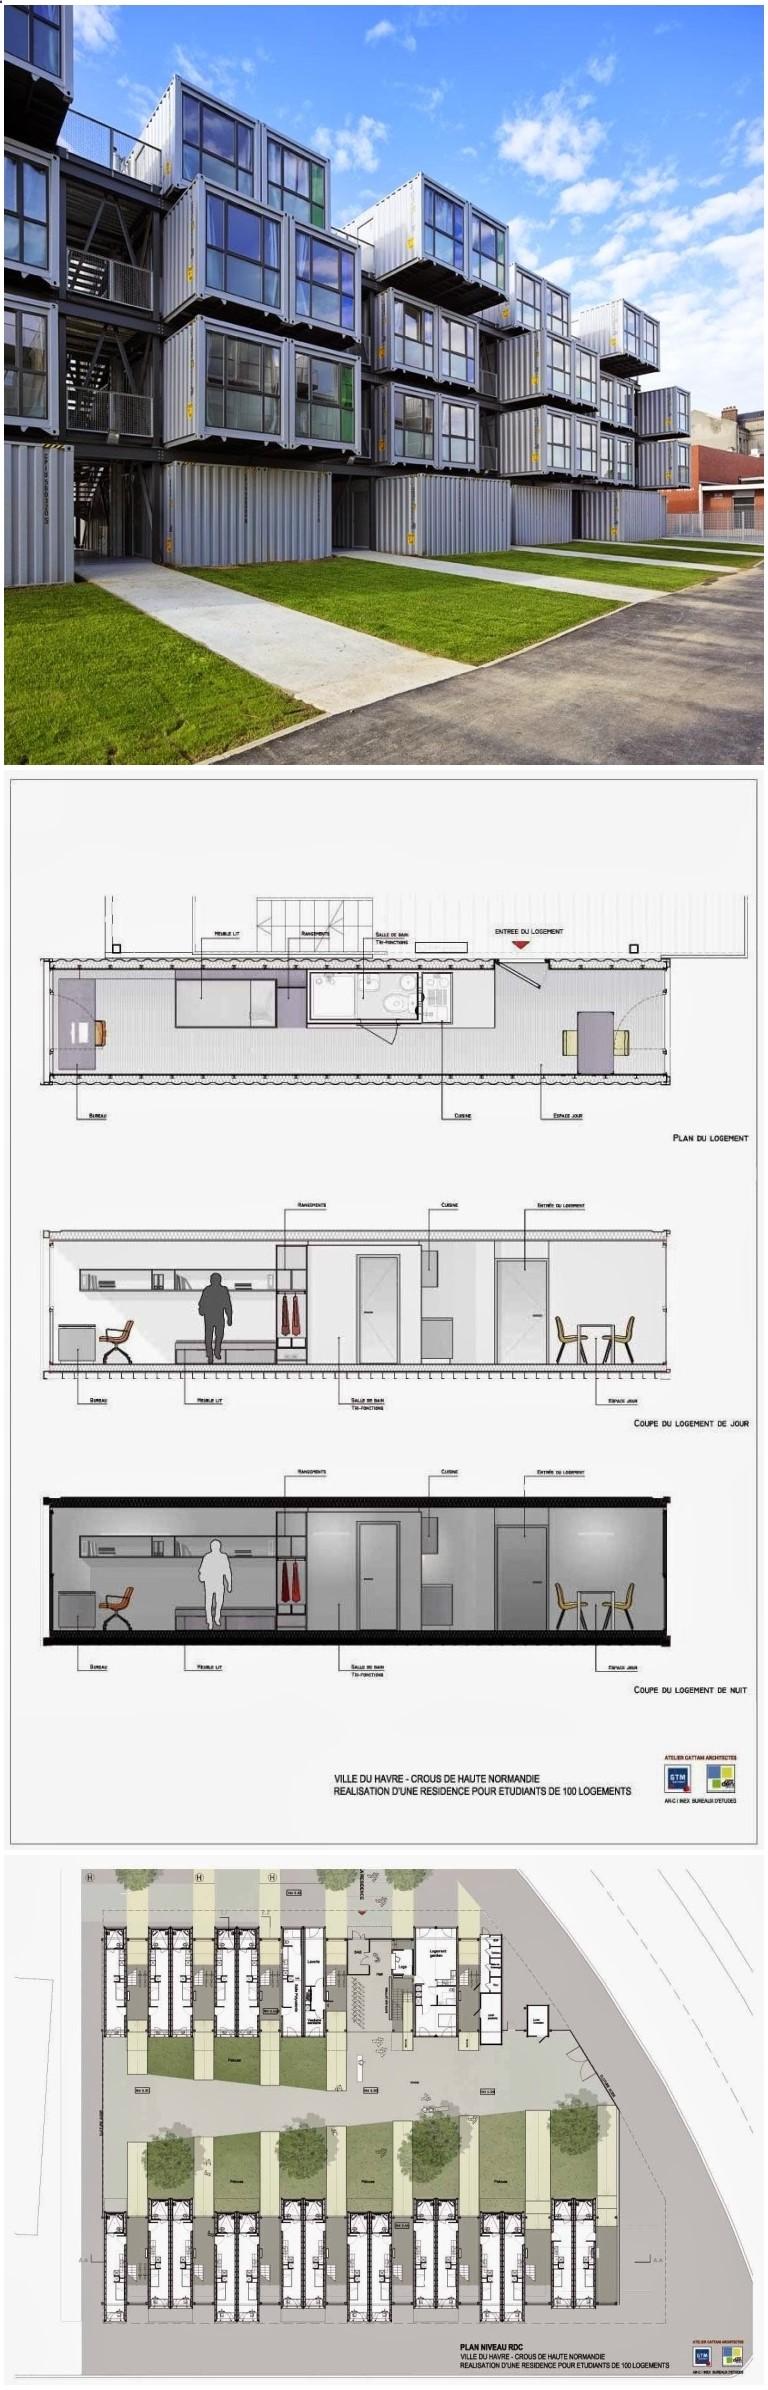 Container house container apartment cité a docks france